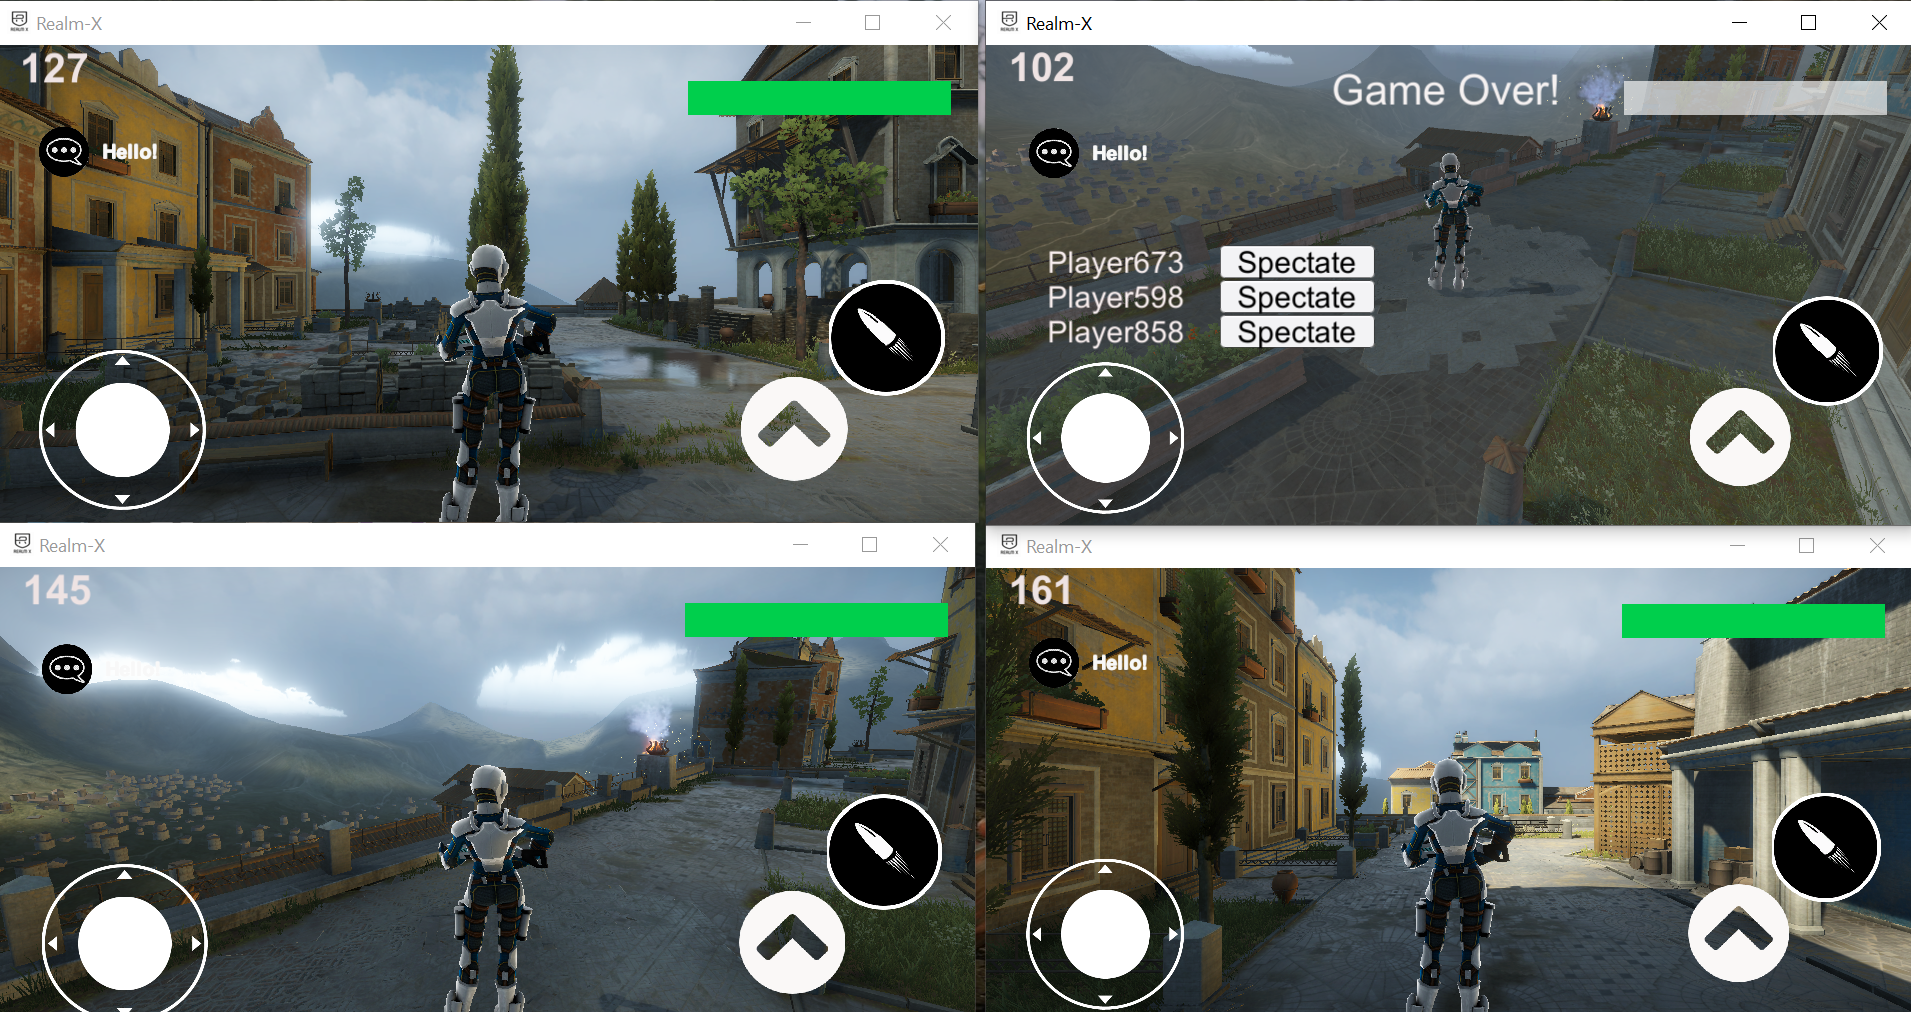 Screenshot (101)